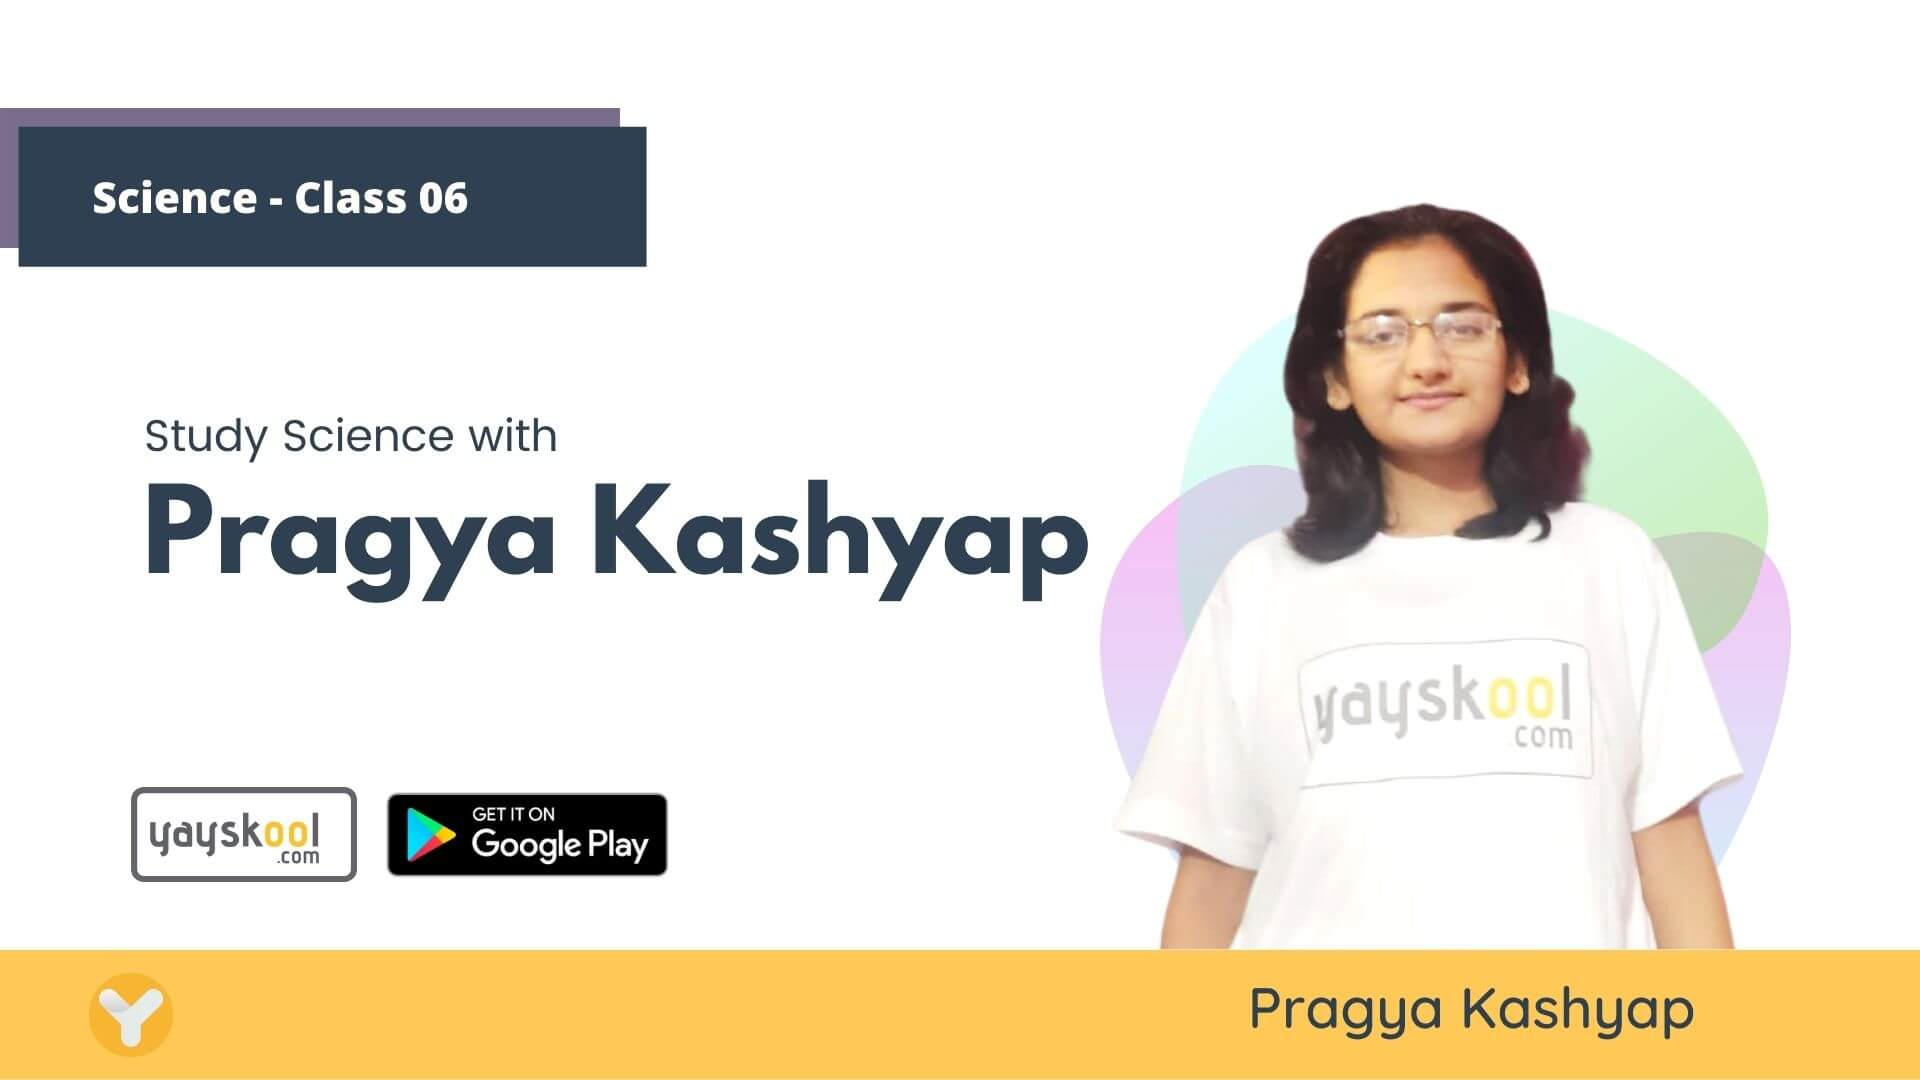 science-course-class06-pragya-kashyap